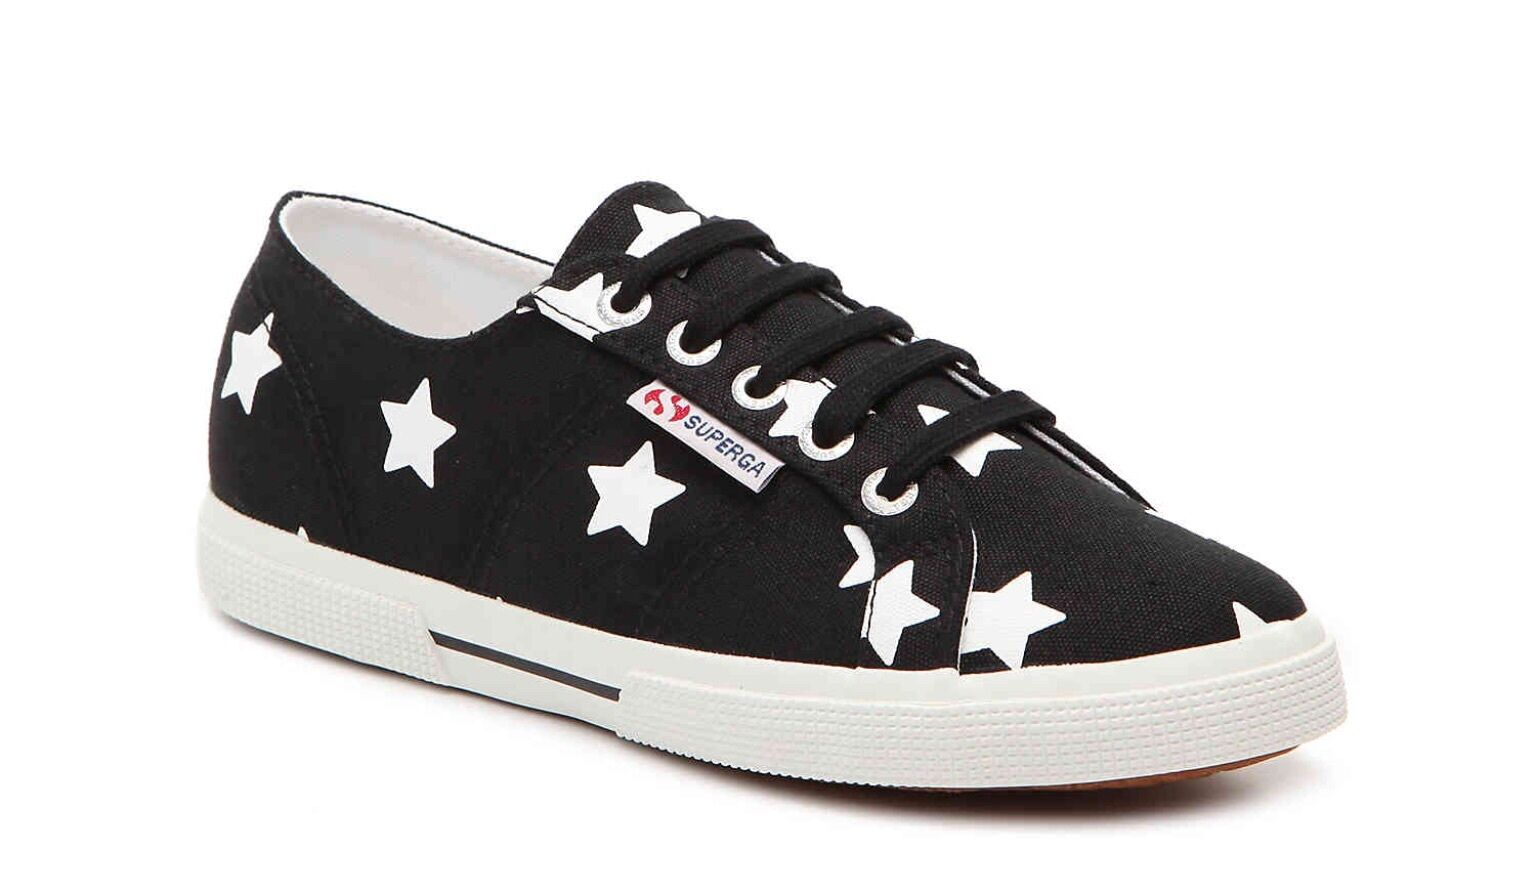 Women's Supergra Sneakers Size 6 1/2 BLACK